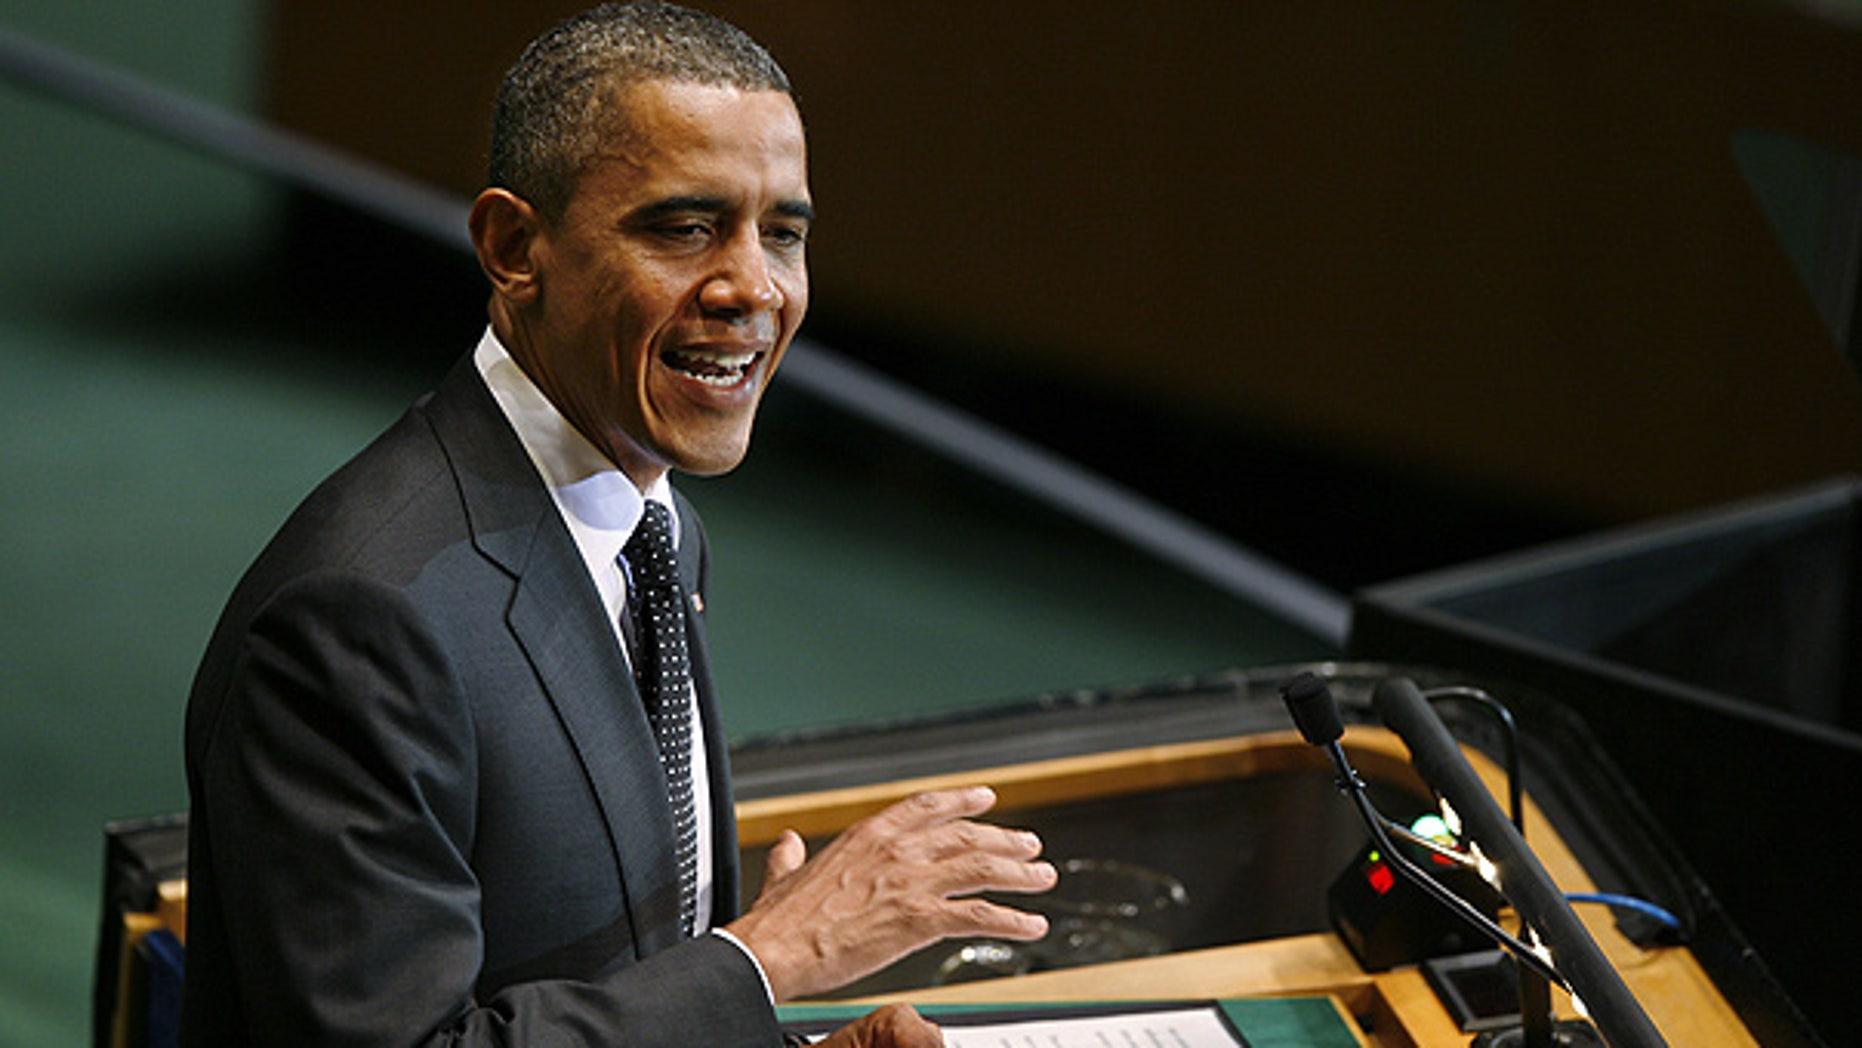 Sept. 22: President Obama speaks at a summit on the Millennium Development Goals at U.N. headquarters.